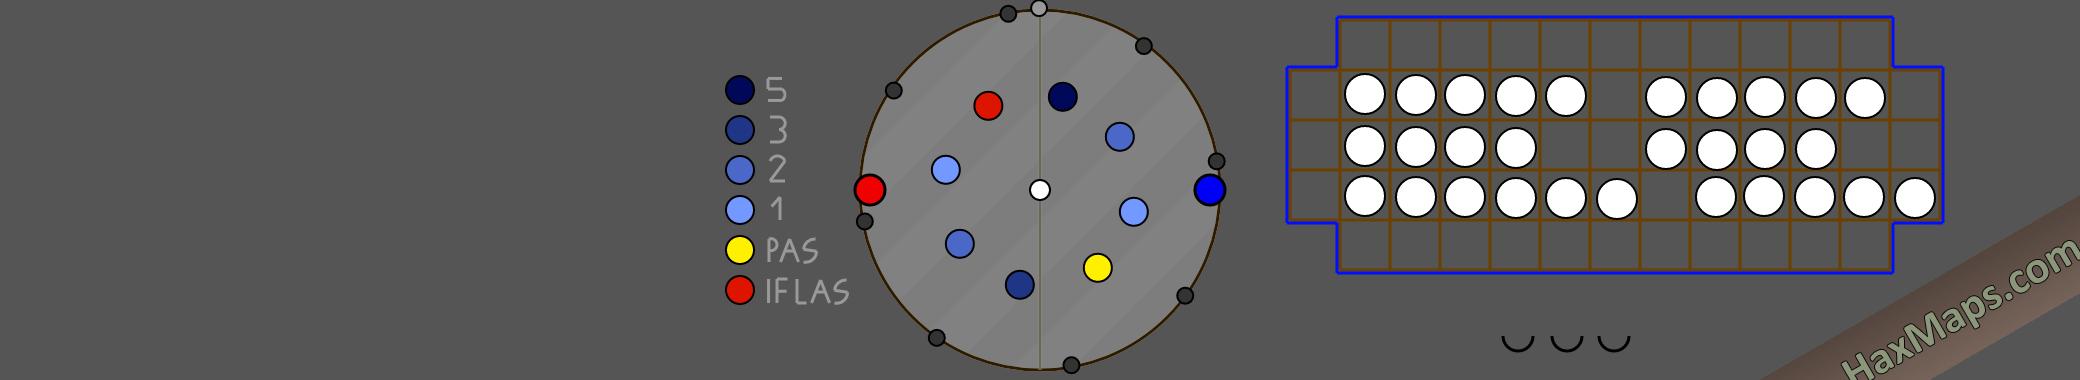 haxball maps | Çarkıfelek S1 | Whell by Vhagar